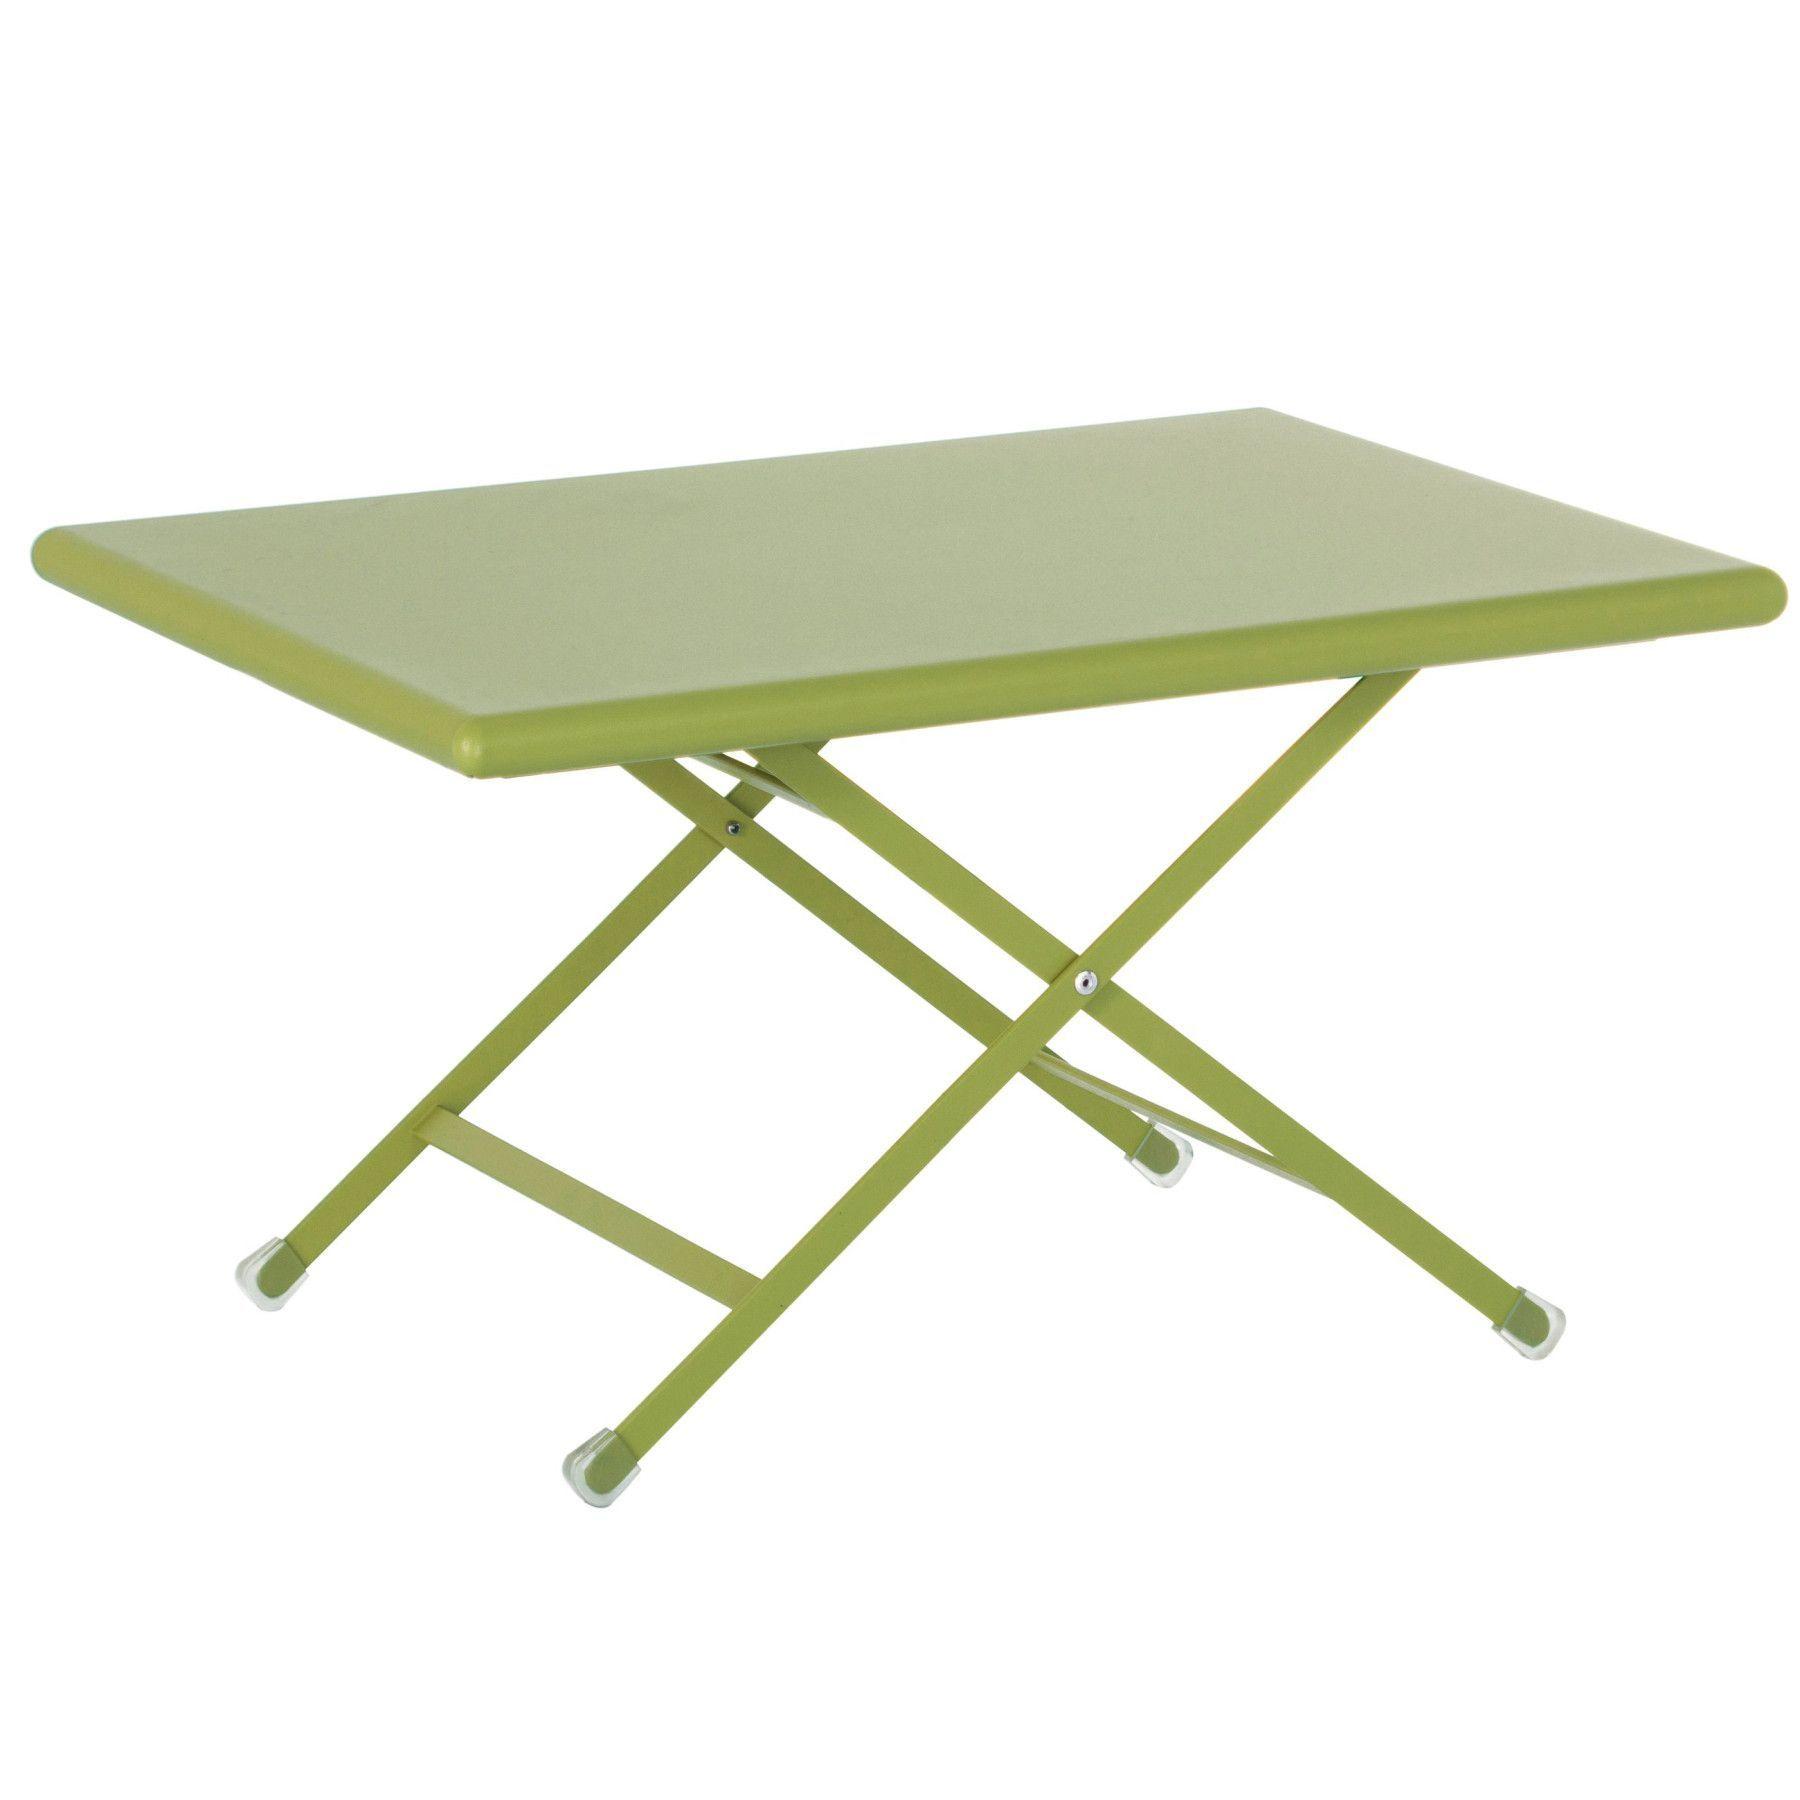 Emu Arc En Ciel Folding Coffee Table Salontafel 70x50 Flinders in sizing 1800 X 1800